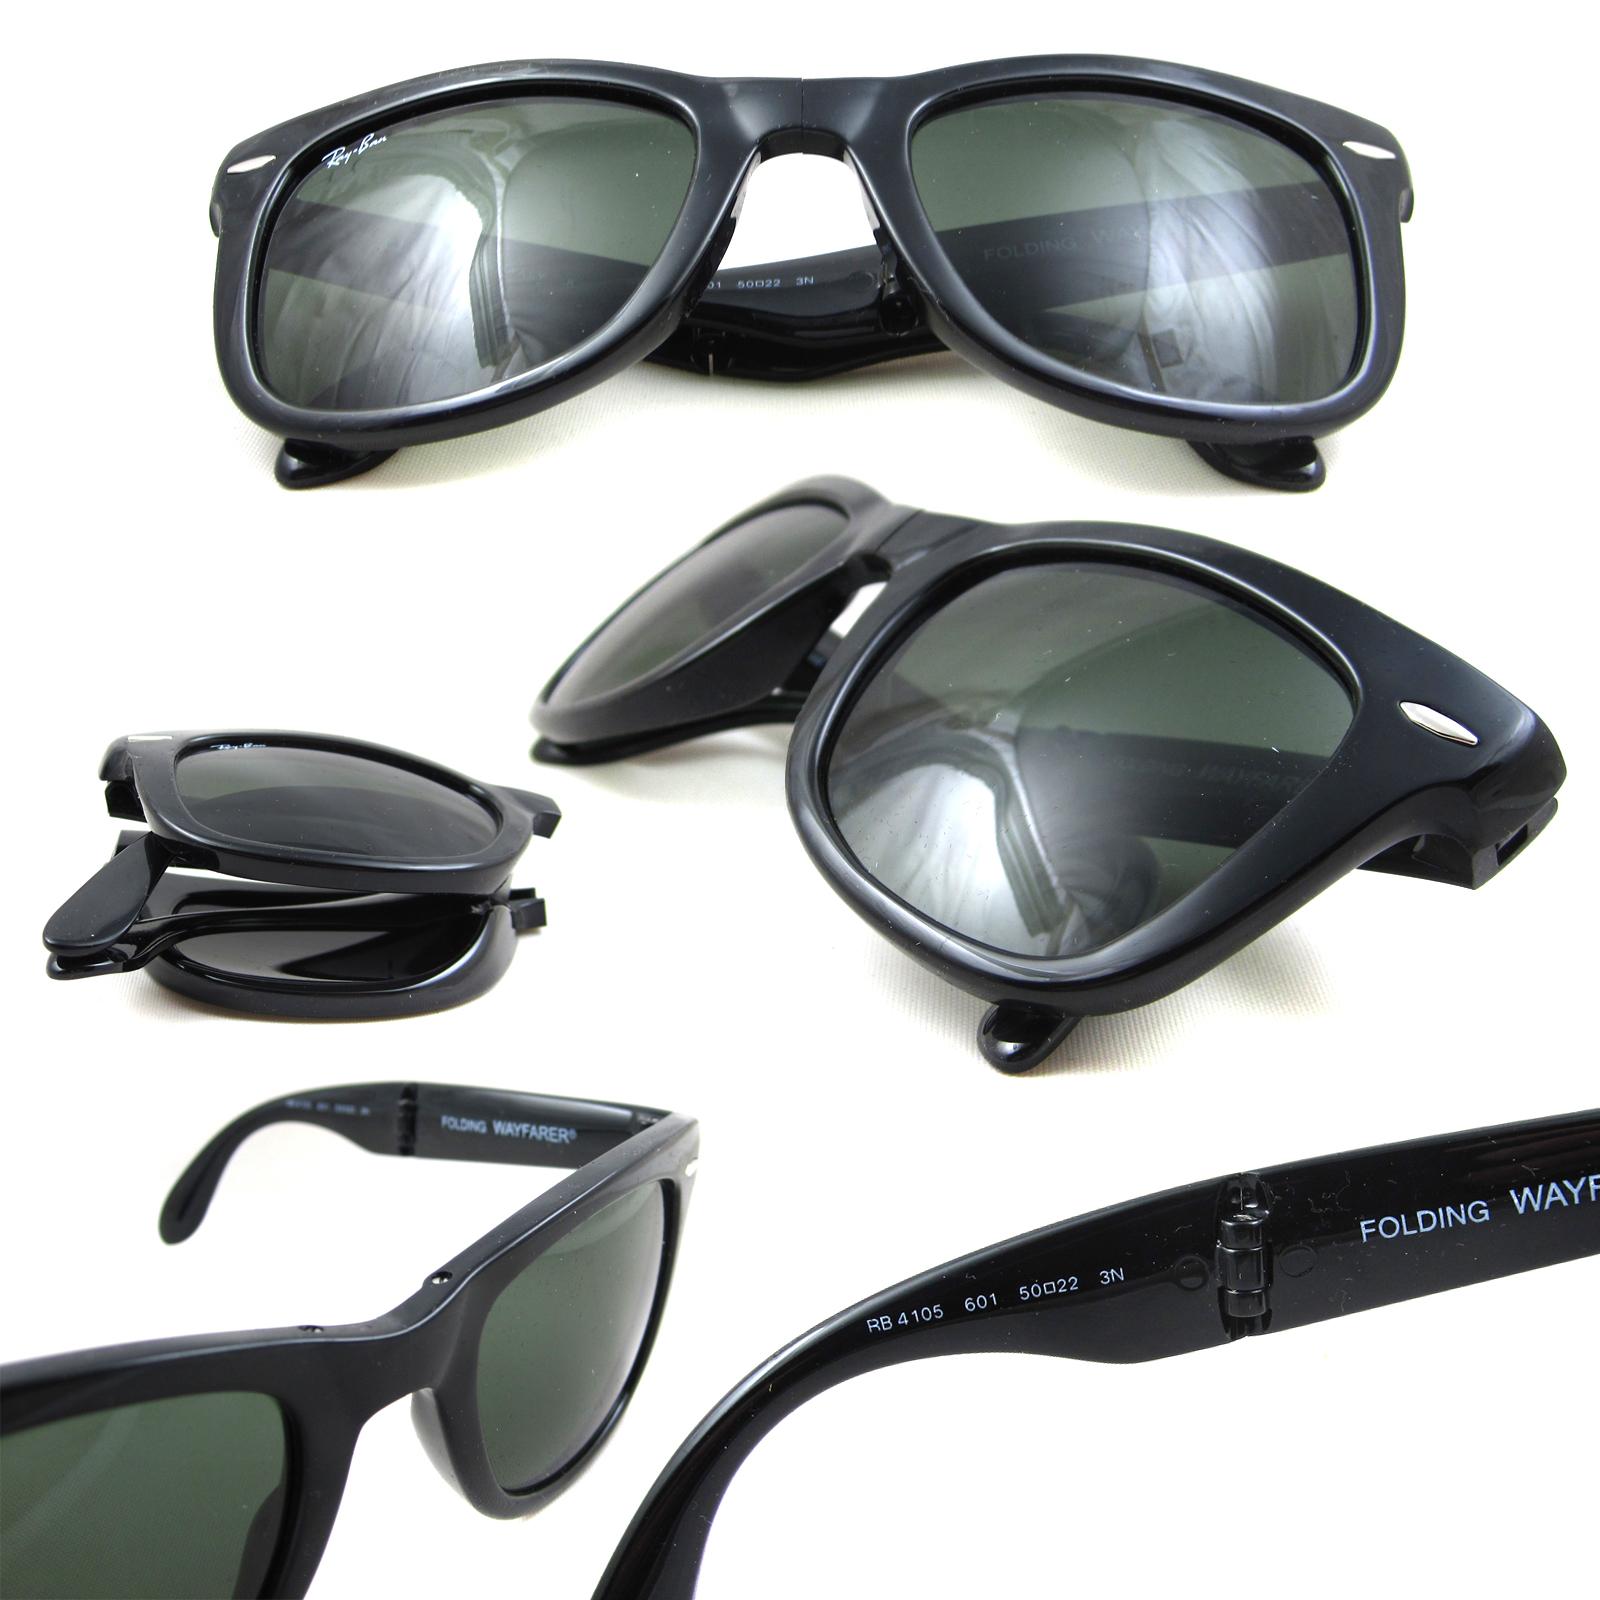 Cheap Ray - Ban Folding Wayfarer 4105 Sunglasses - Discounted Sunglasses